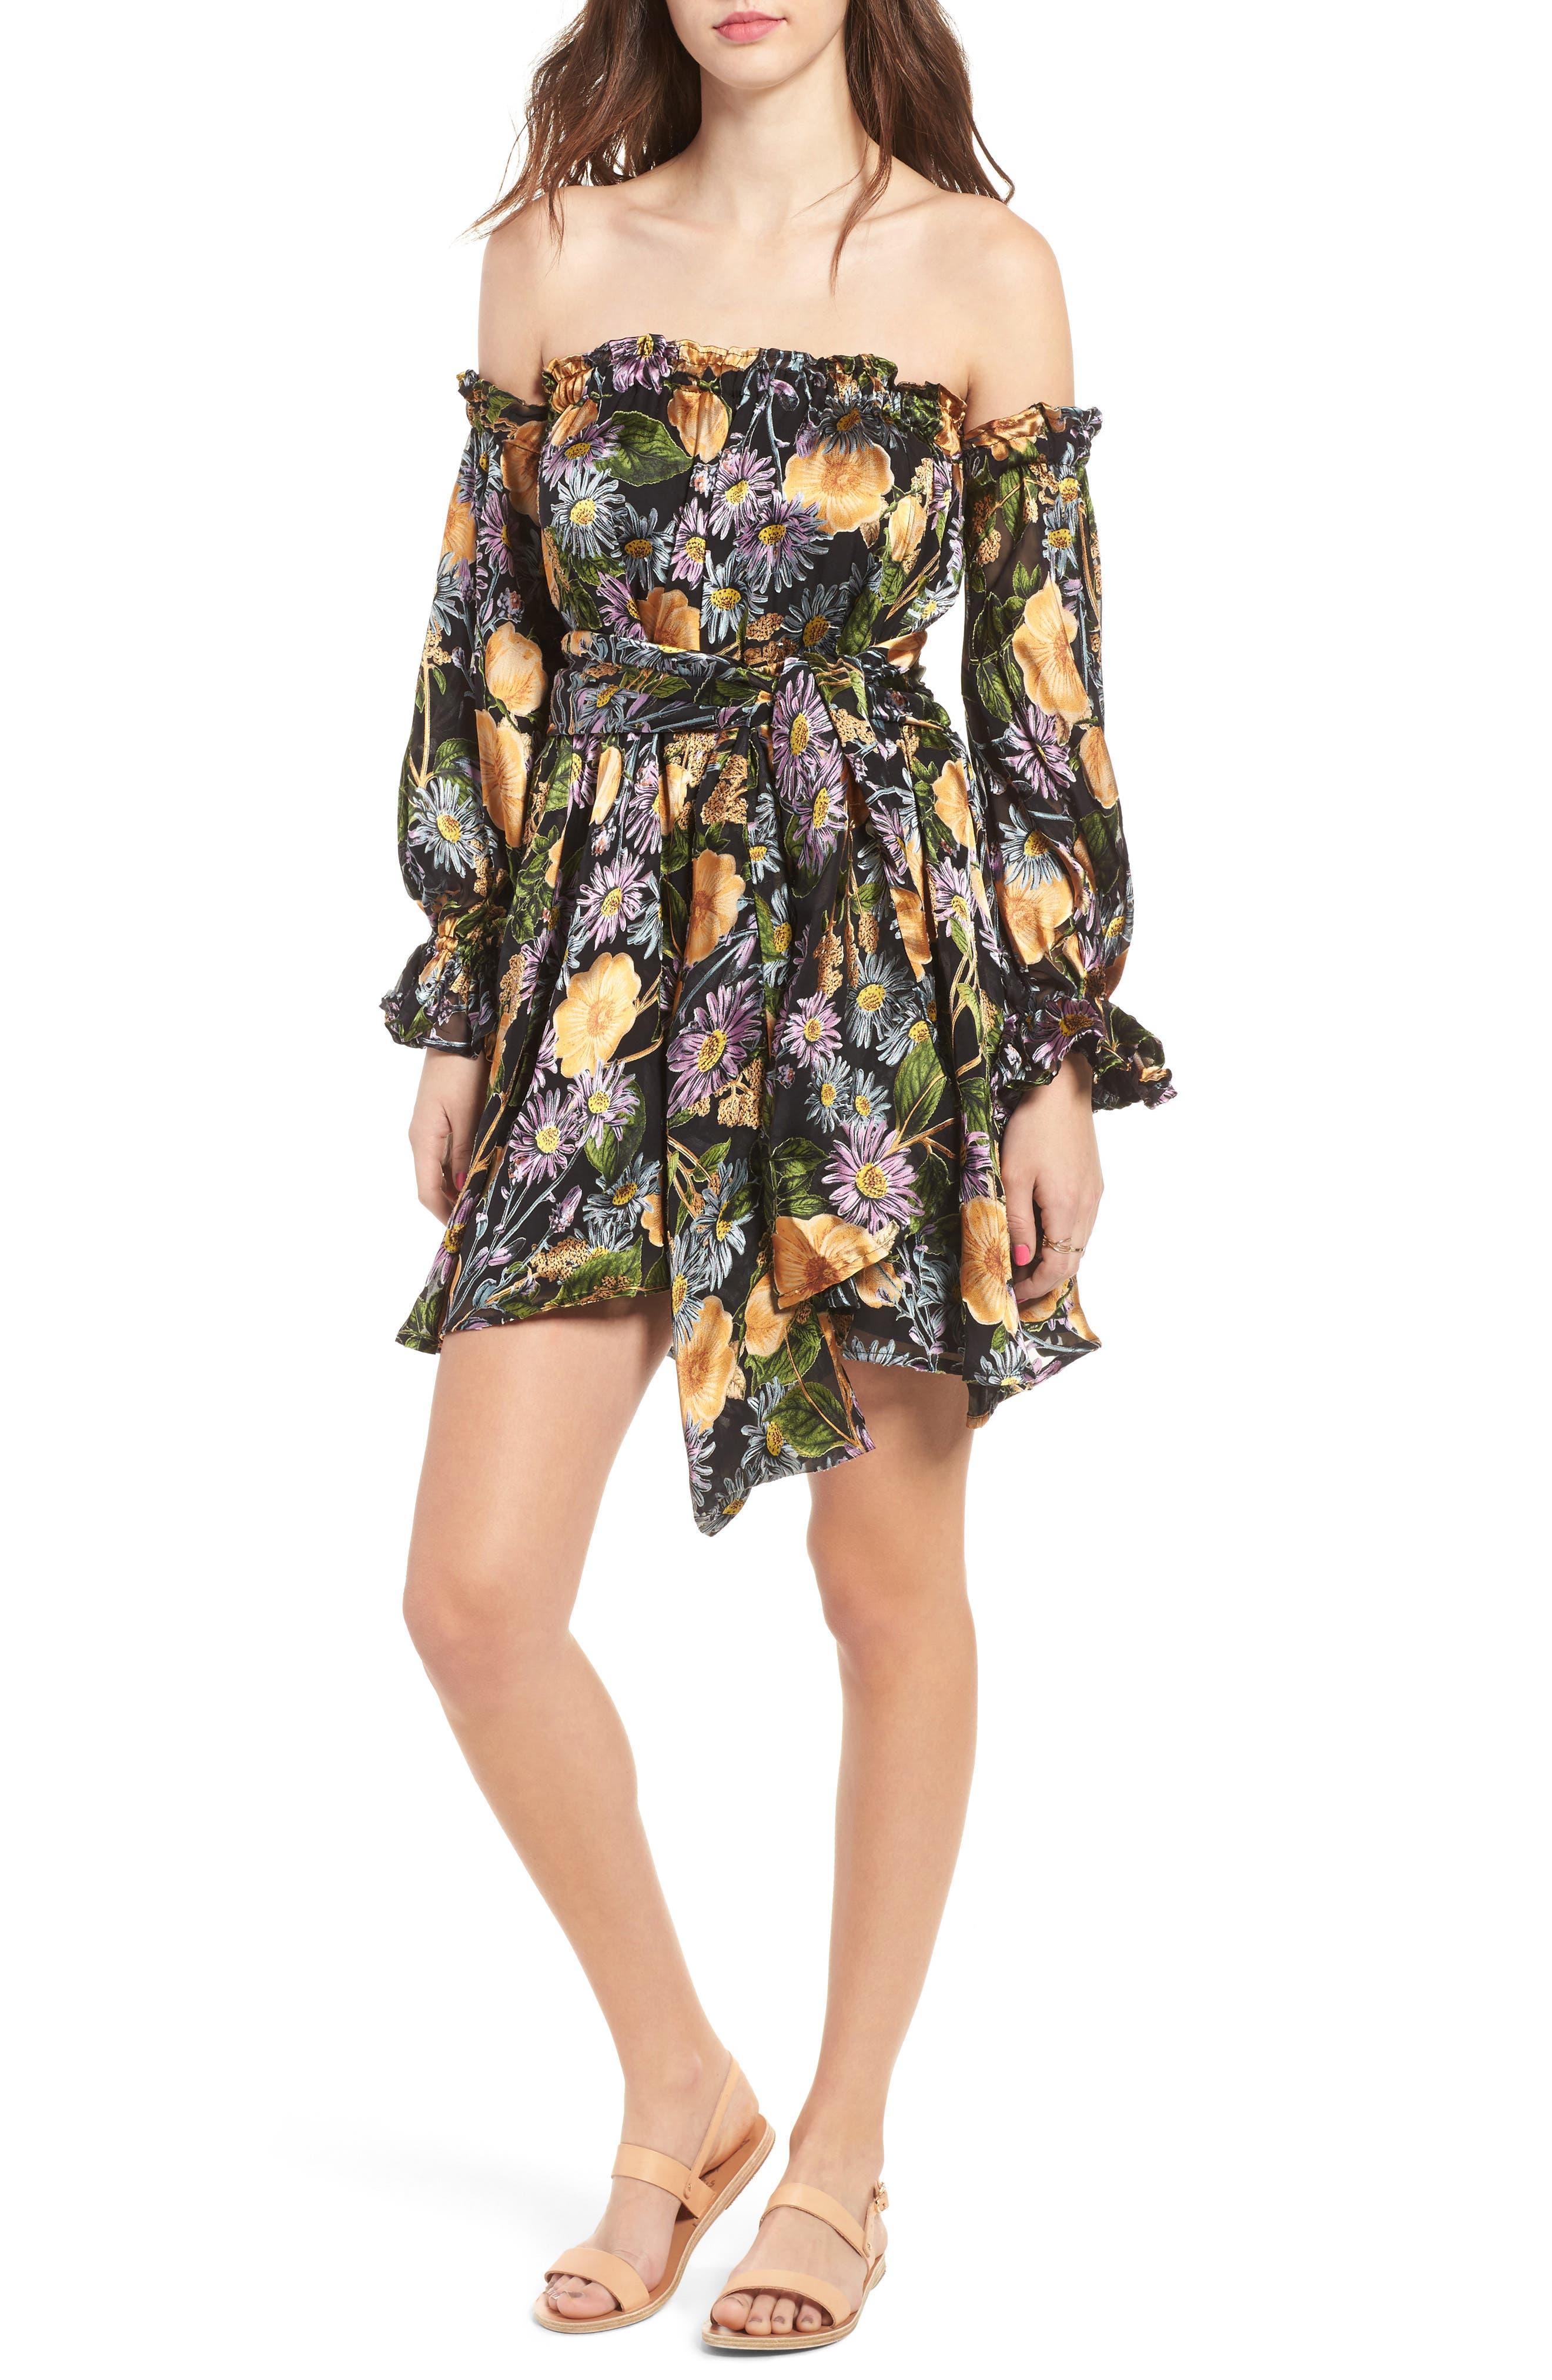 FOR LOVE & LEMONS, Luciana Strapless Fit & Flare Dress, Main thumbnail 1, color, 010